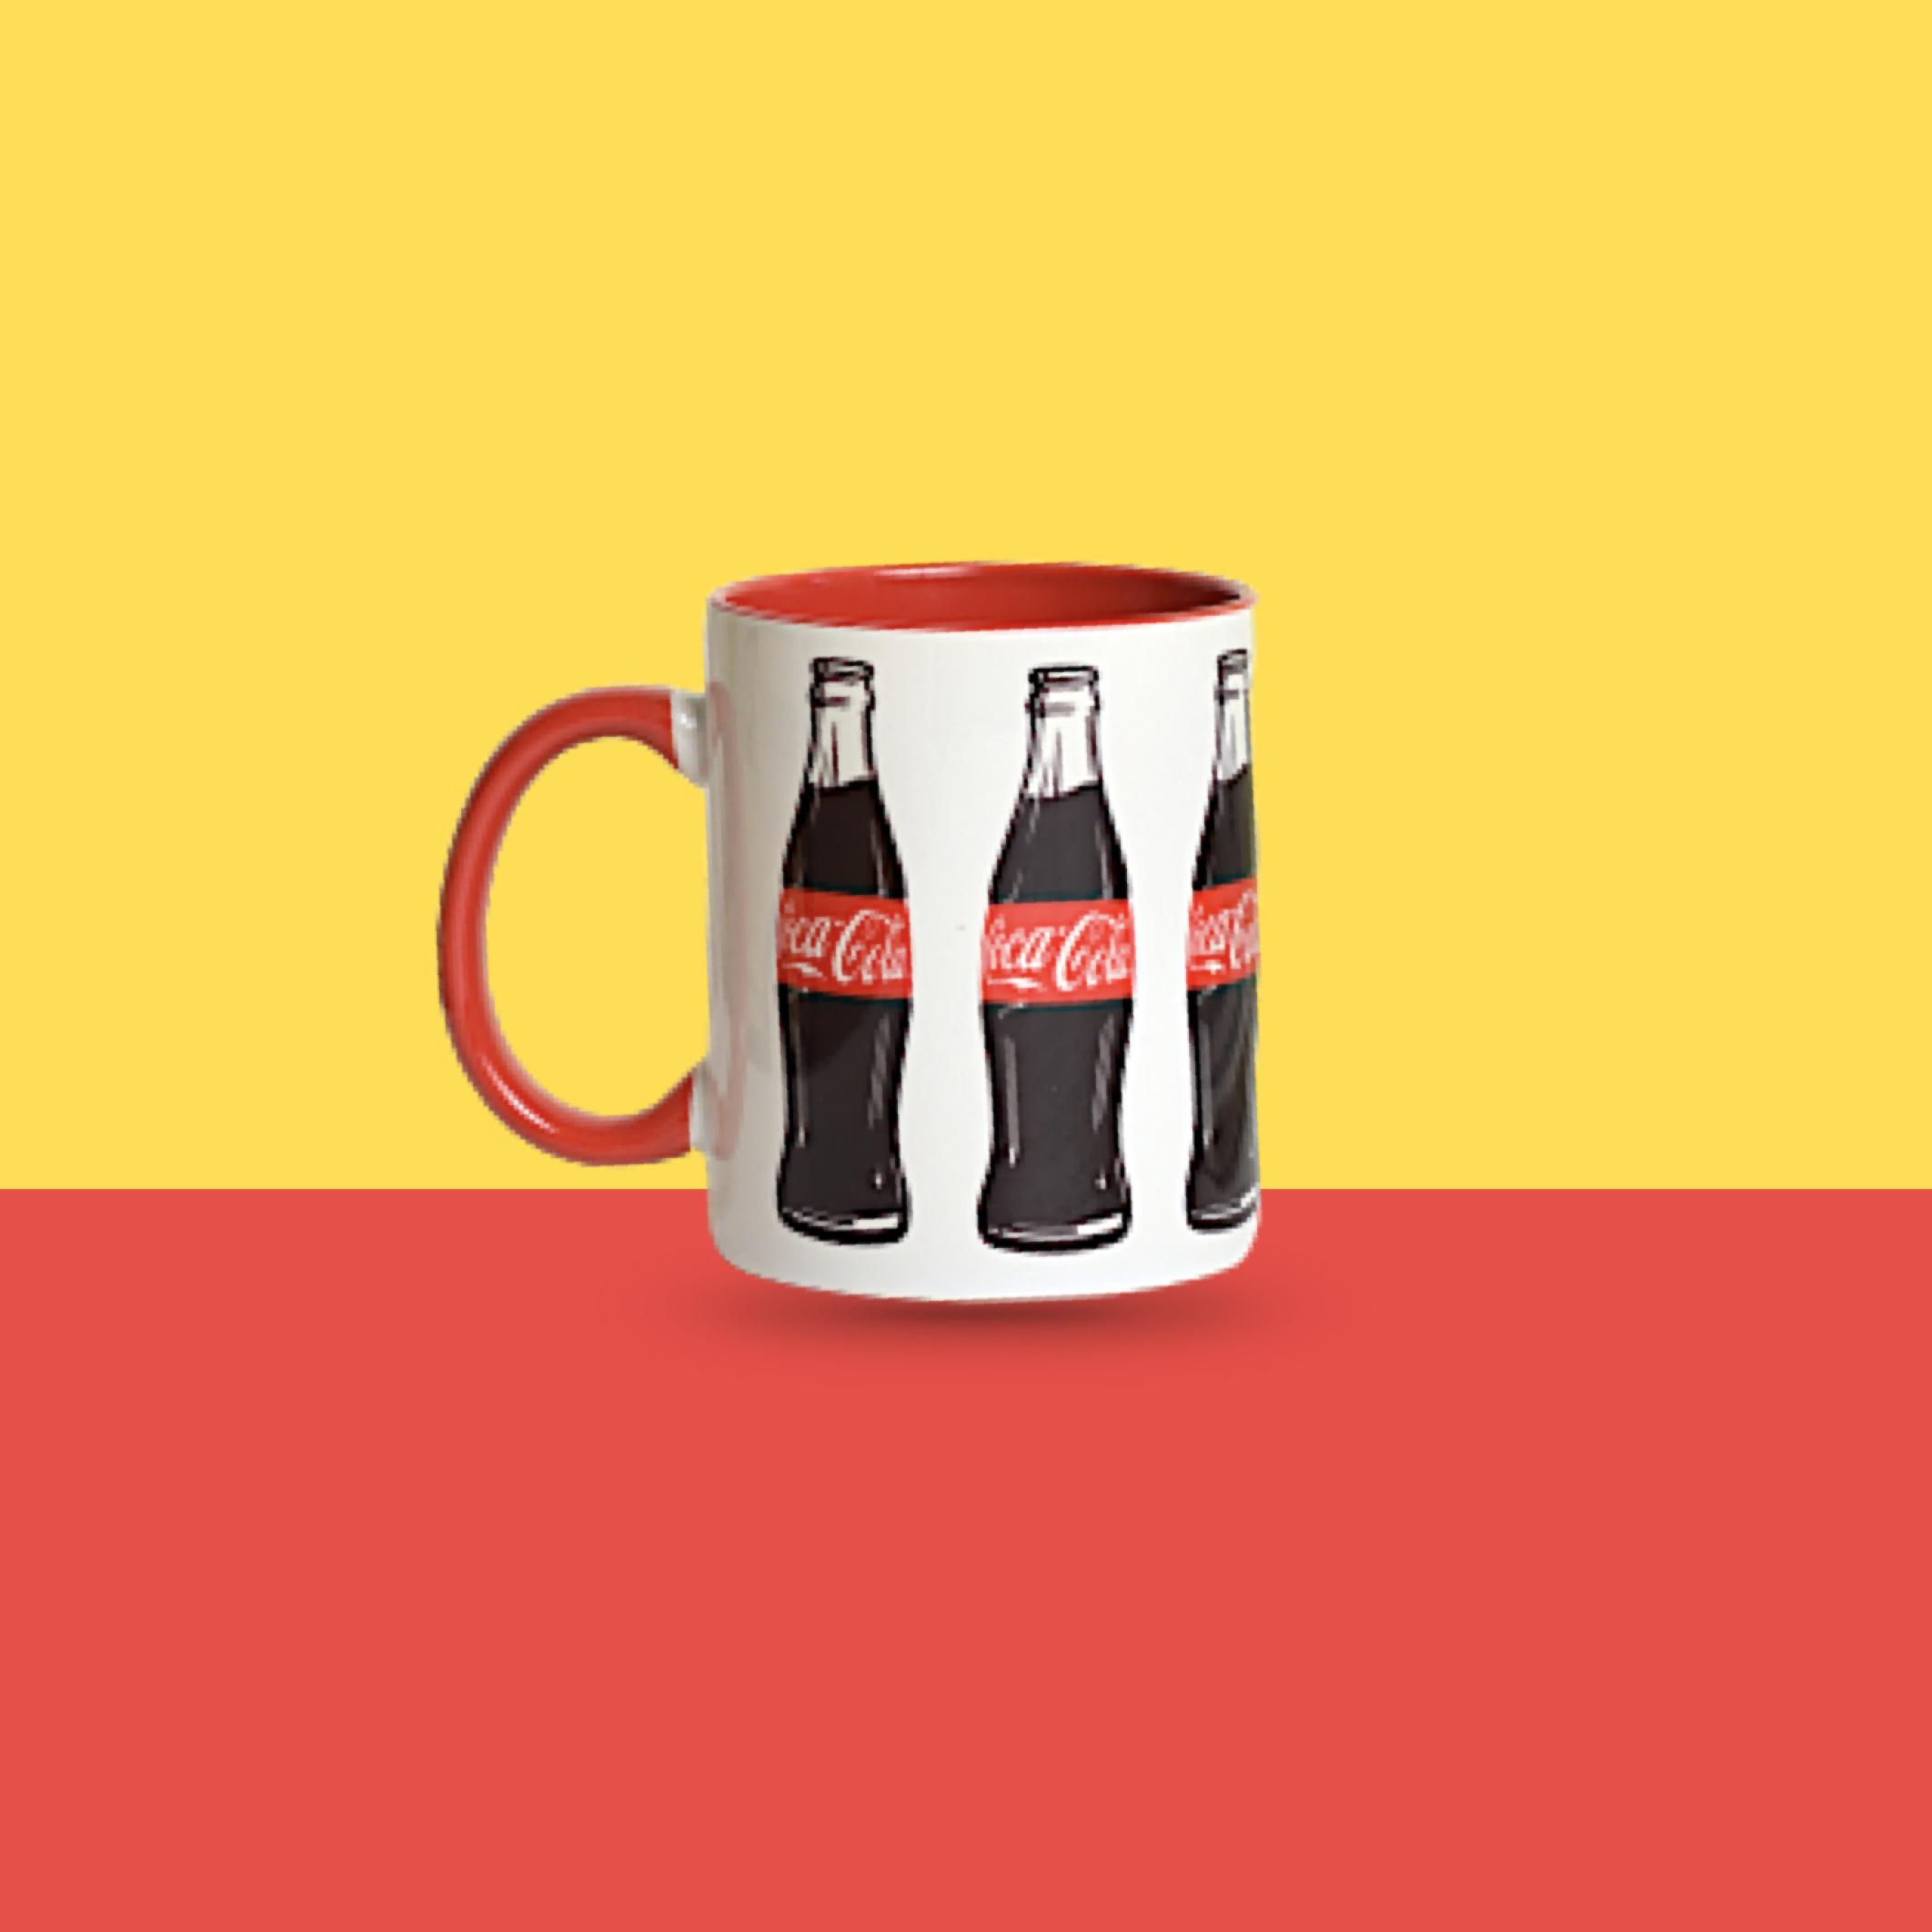 خرید ماگ کوکاکولا